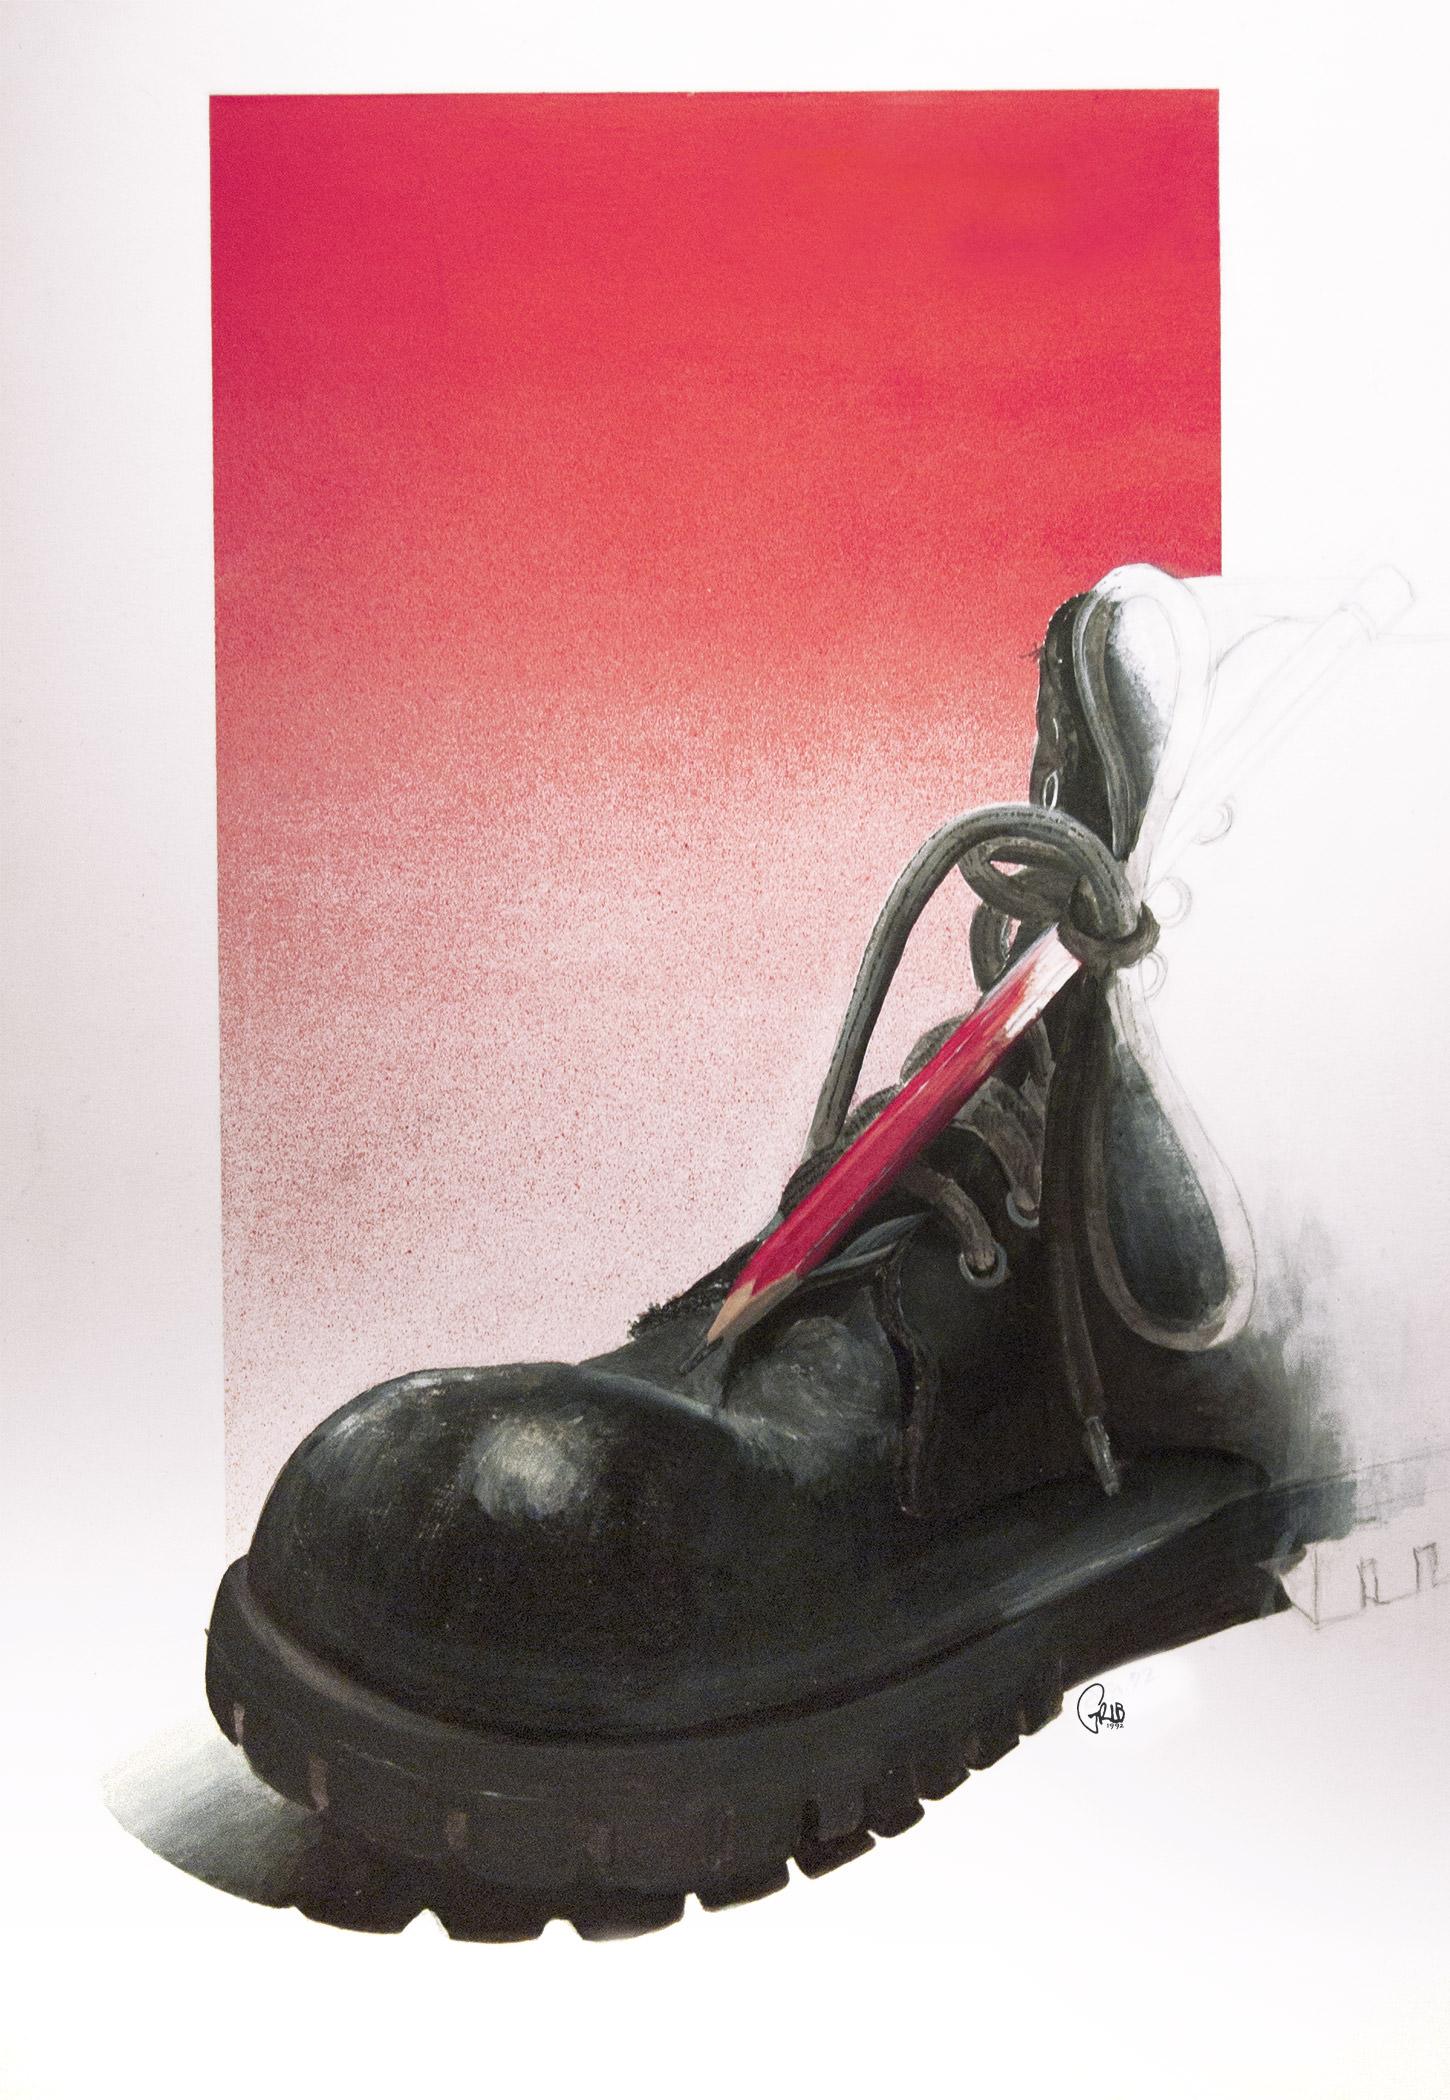 Grib Chaussure Artiste Acrylique